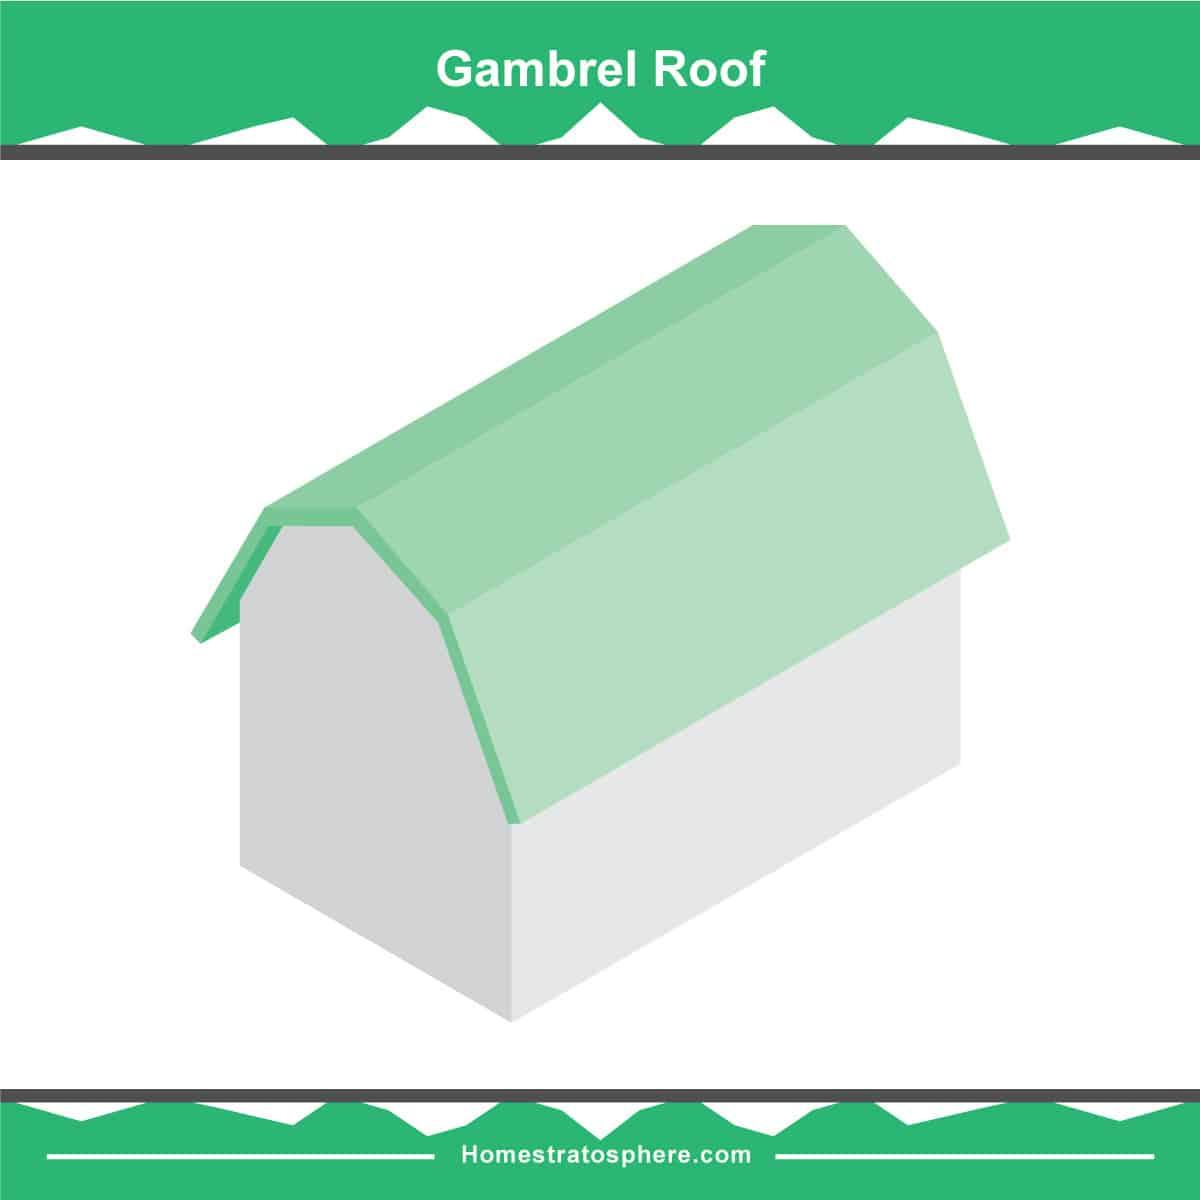 Gambrel roof diagram